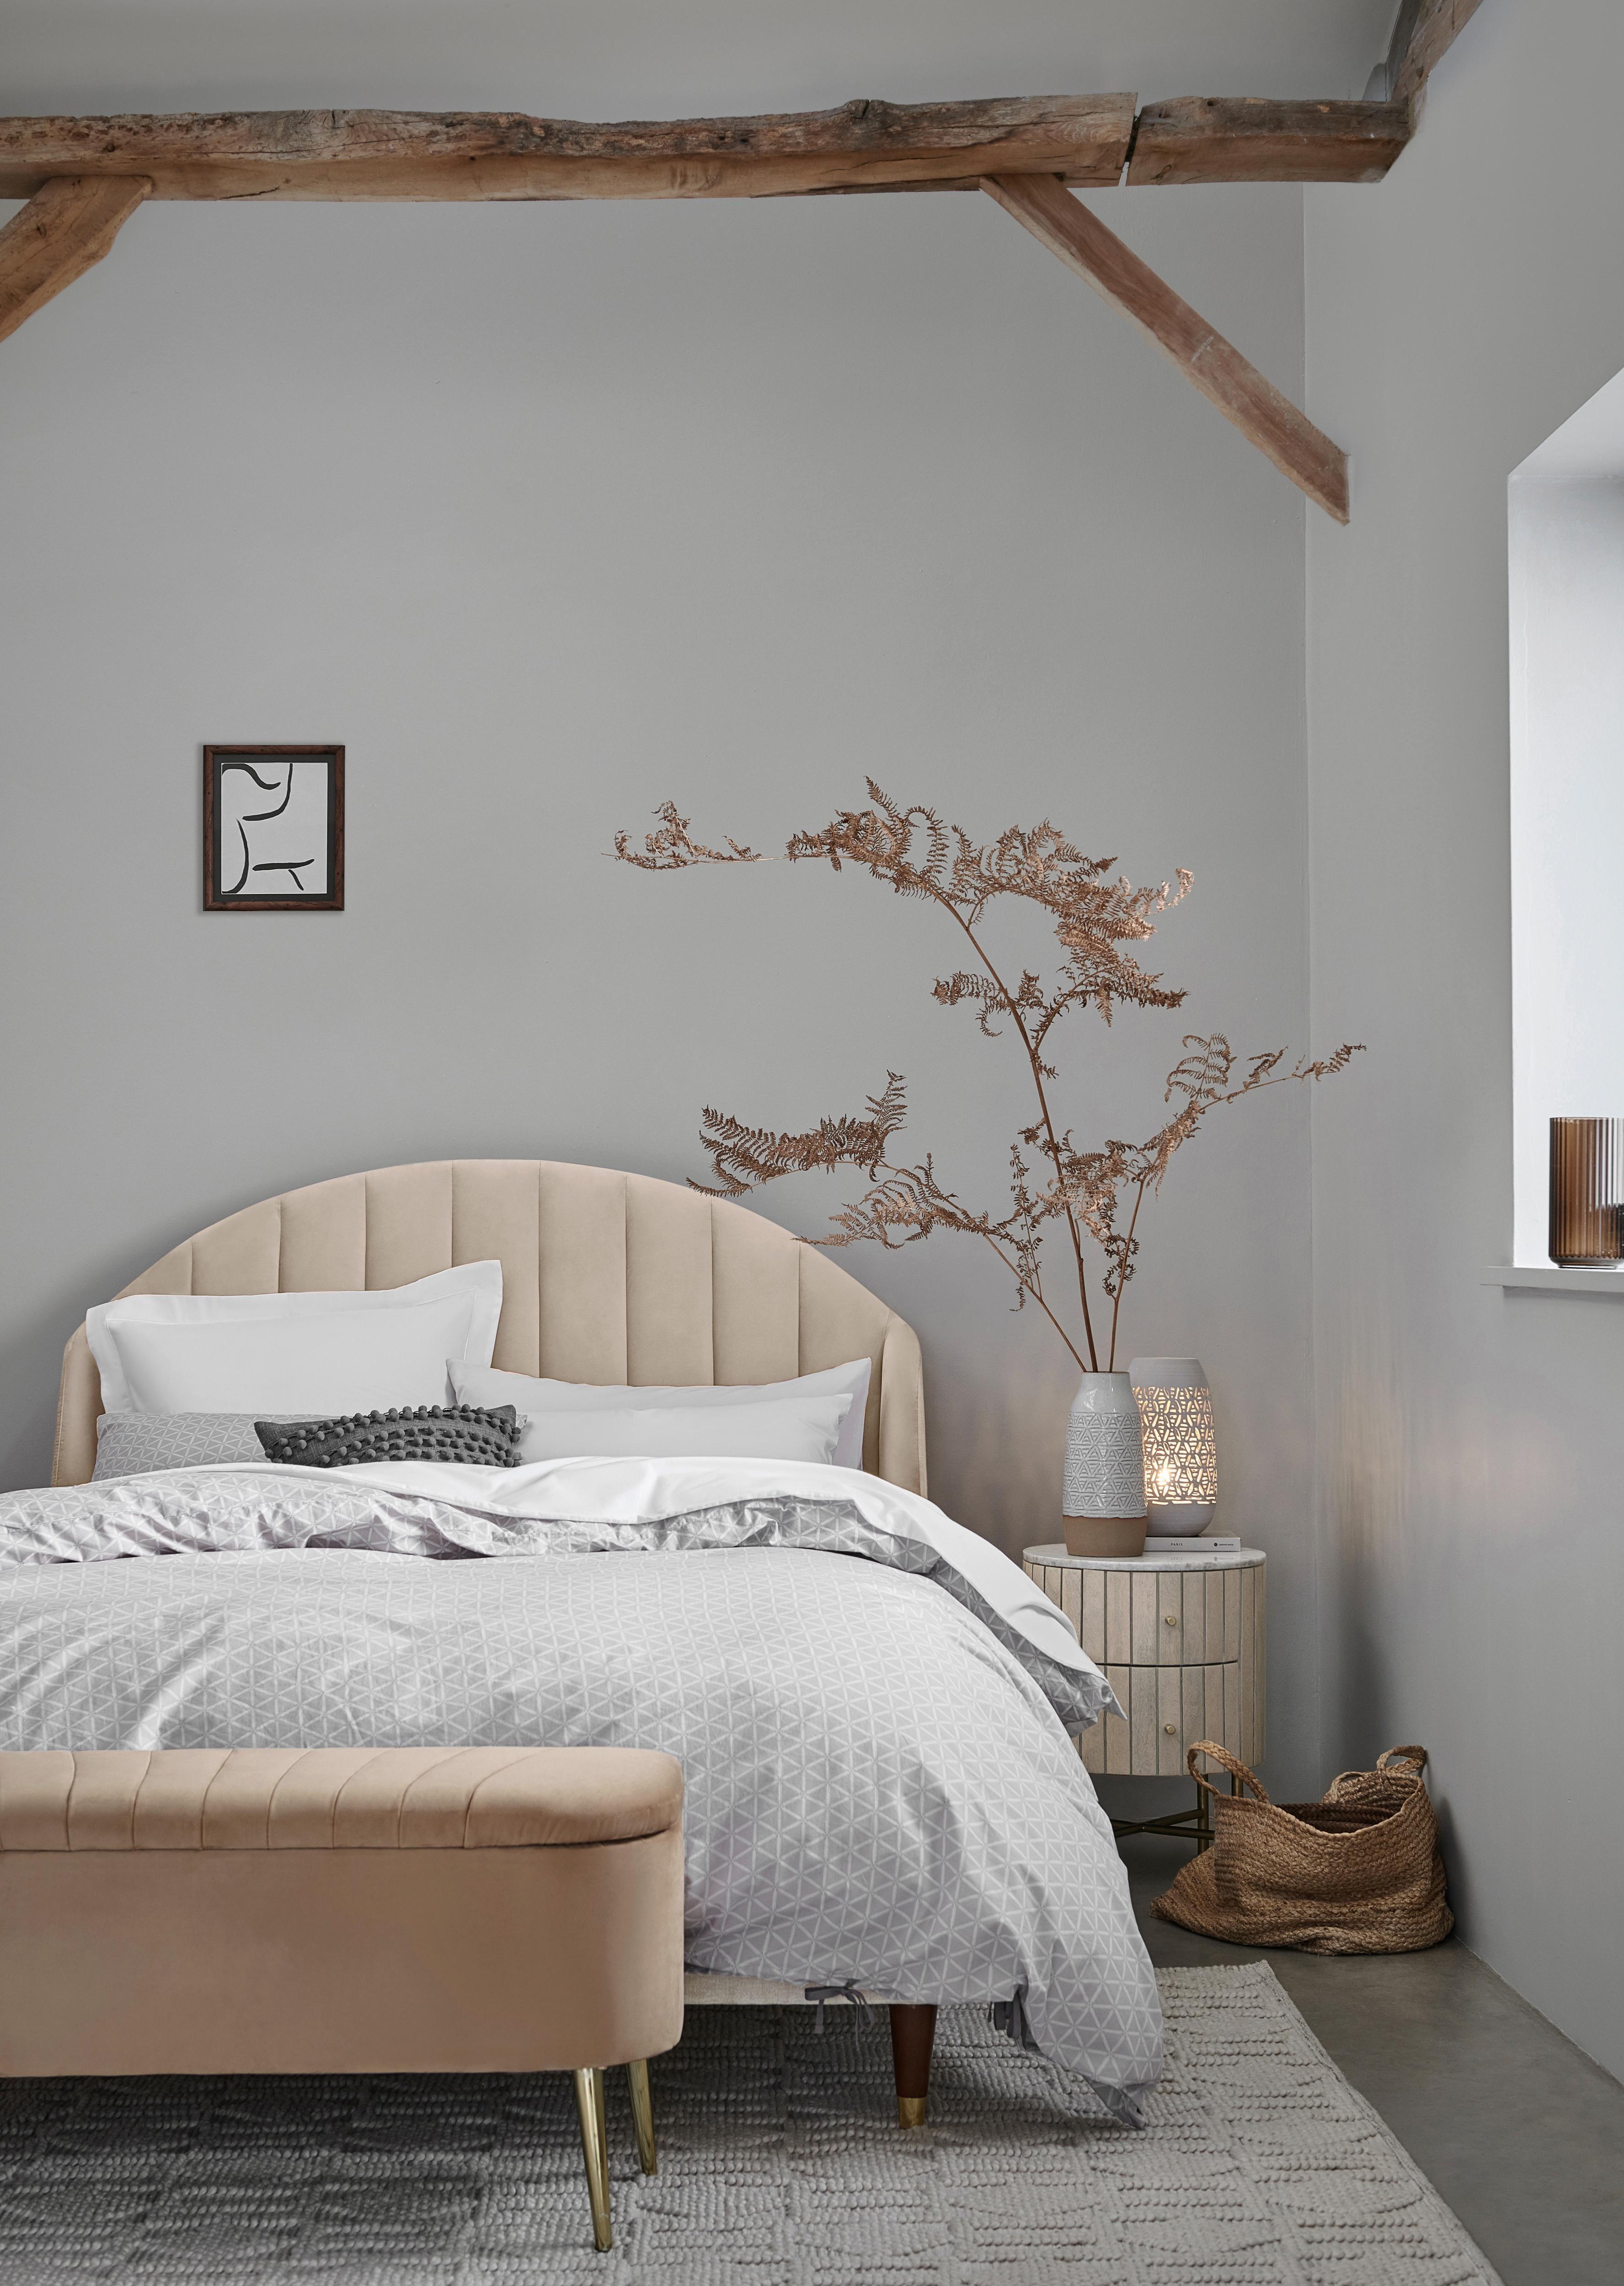 12 Bedroom Decor Trends to Embrace — Bedroom Ideas